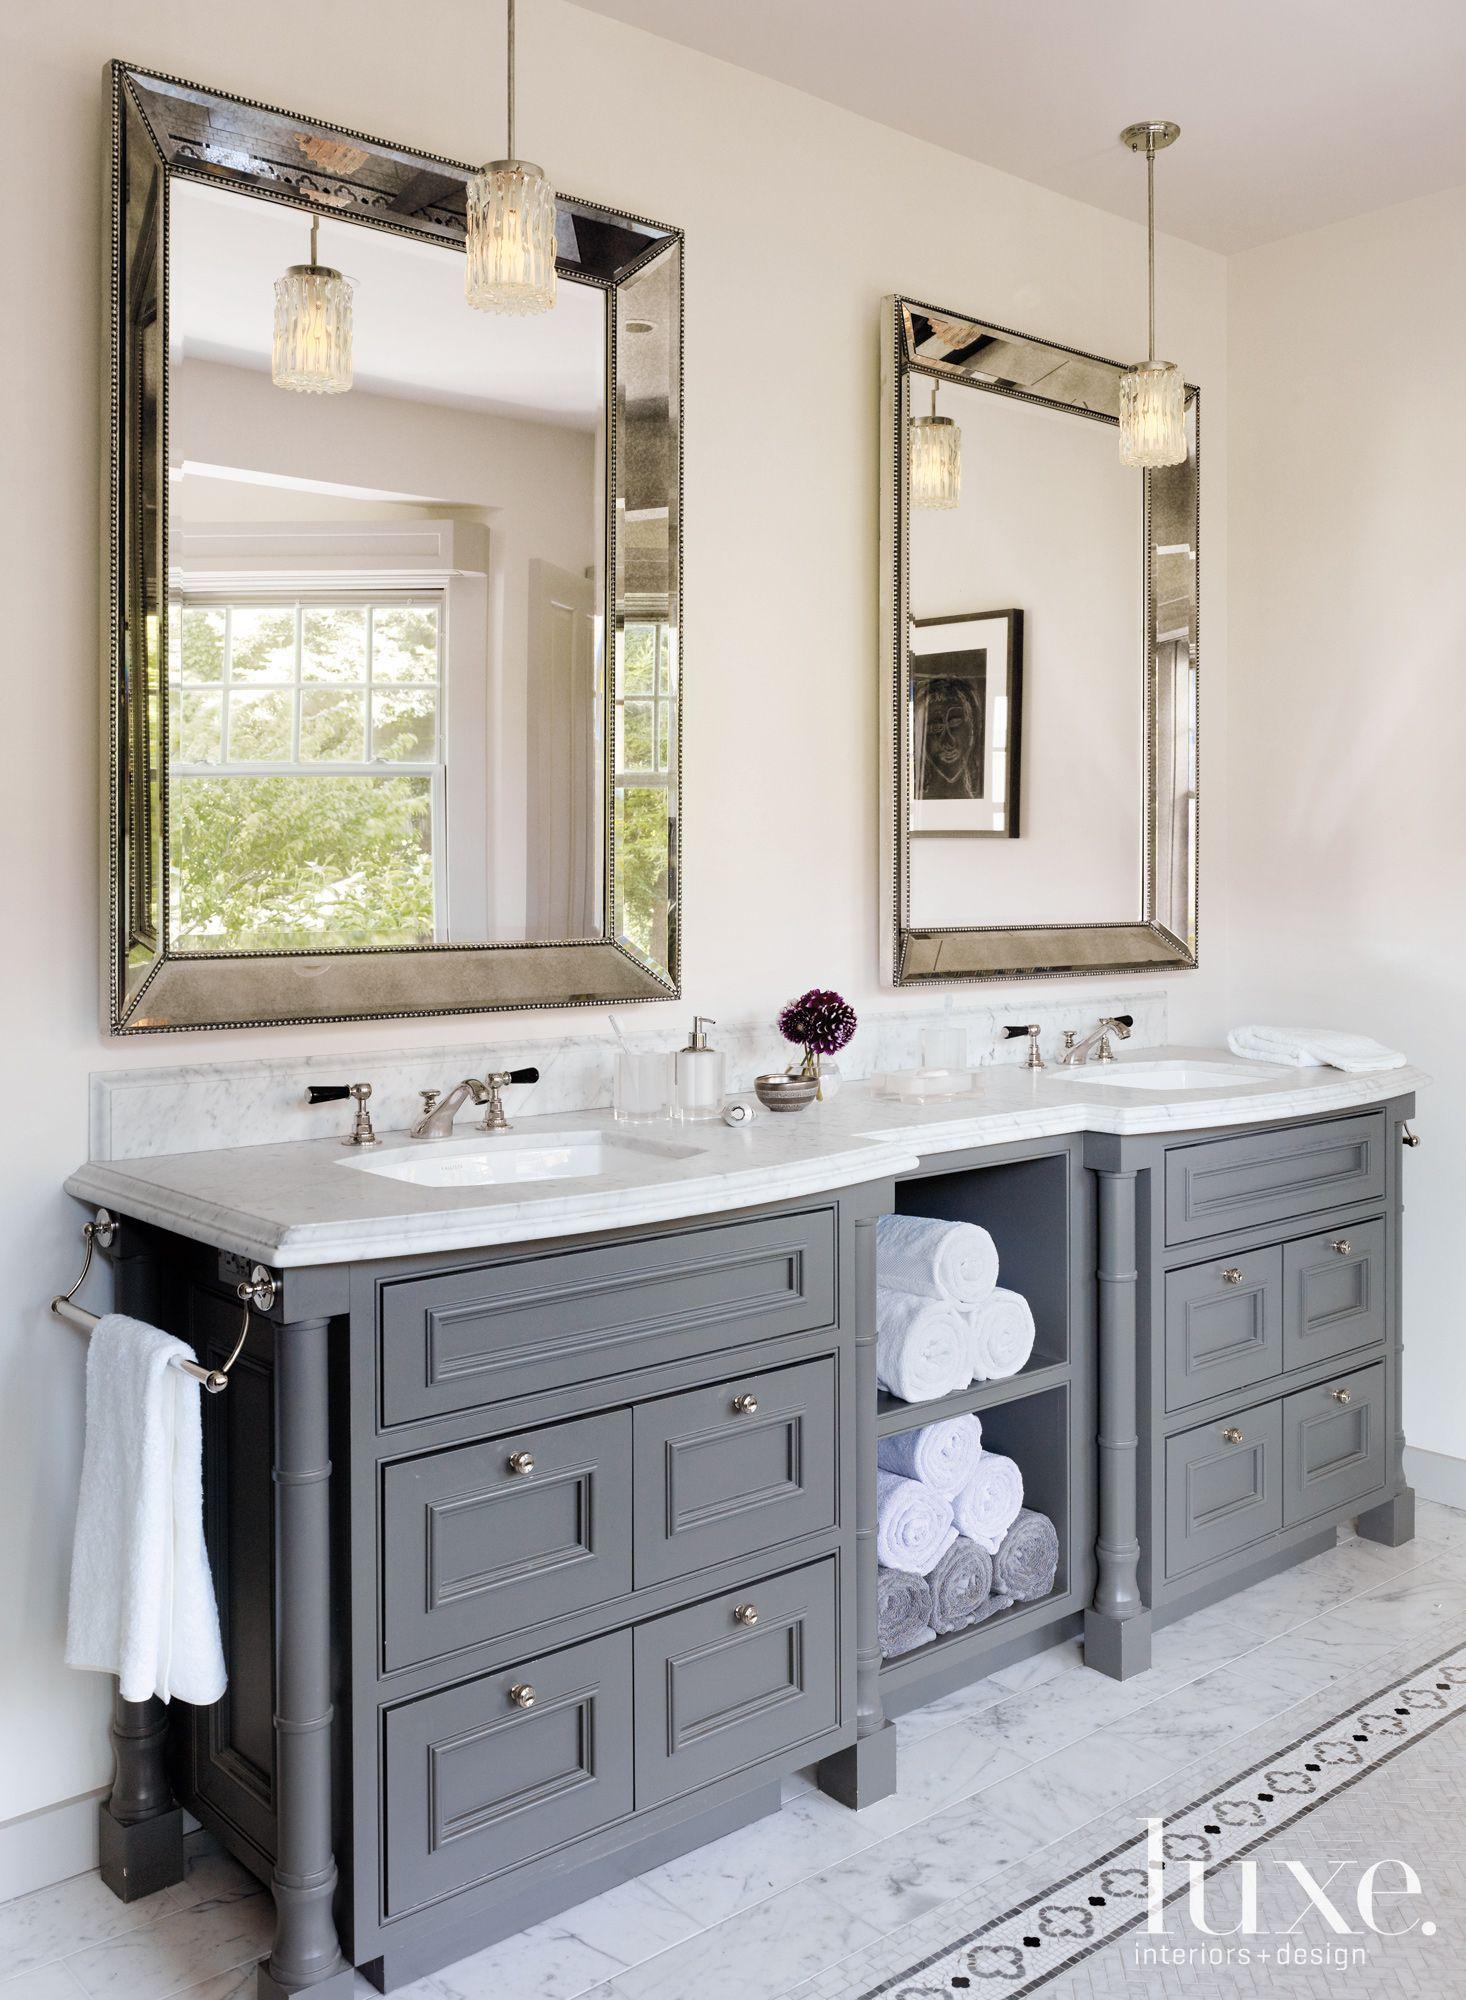 In The Master Bathroom Rosenfeld Hung A Pair Of Midcentury Nickel And Crystal Pendant Cheap Bathroom Vanities Traditional Bathroom Grey Traditional Bathrooms